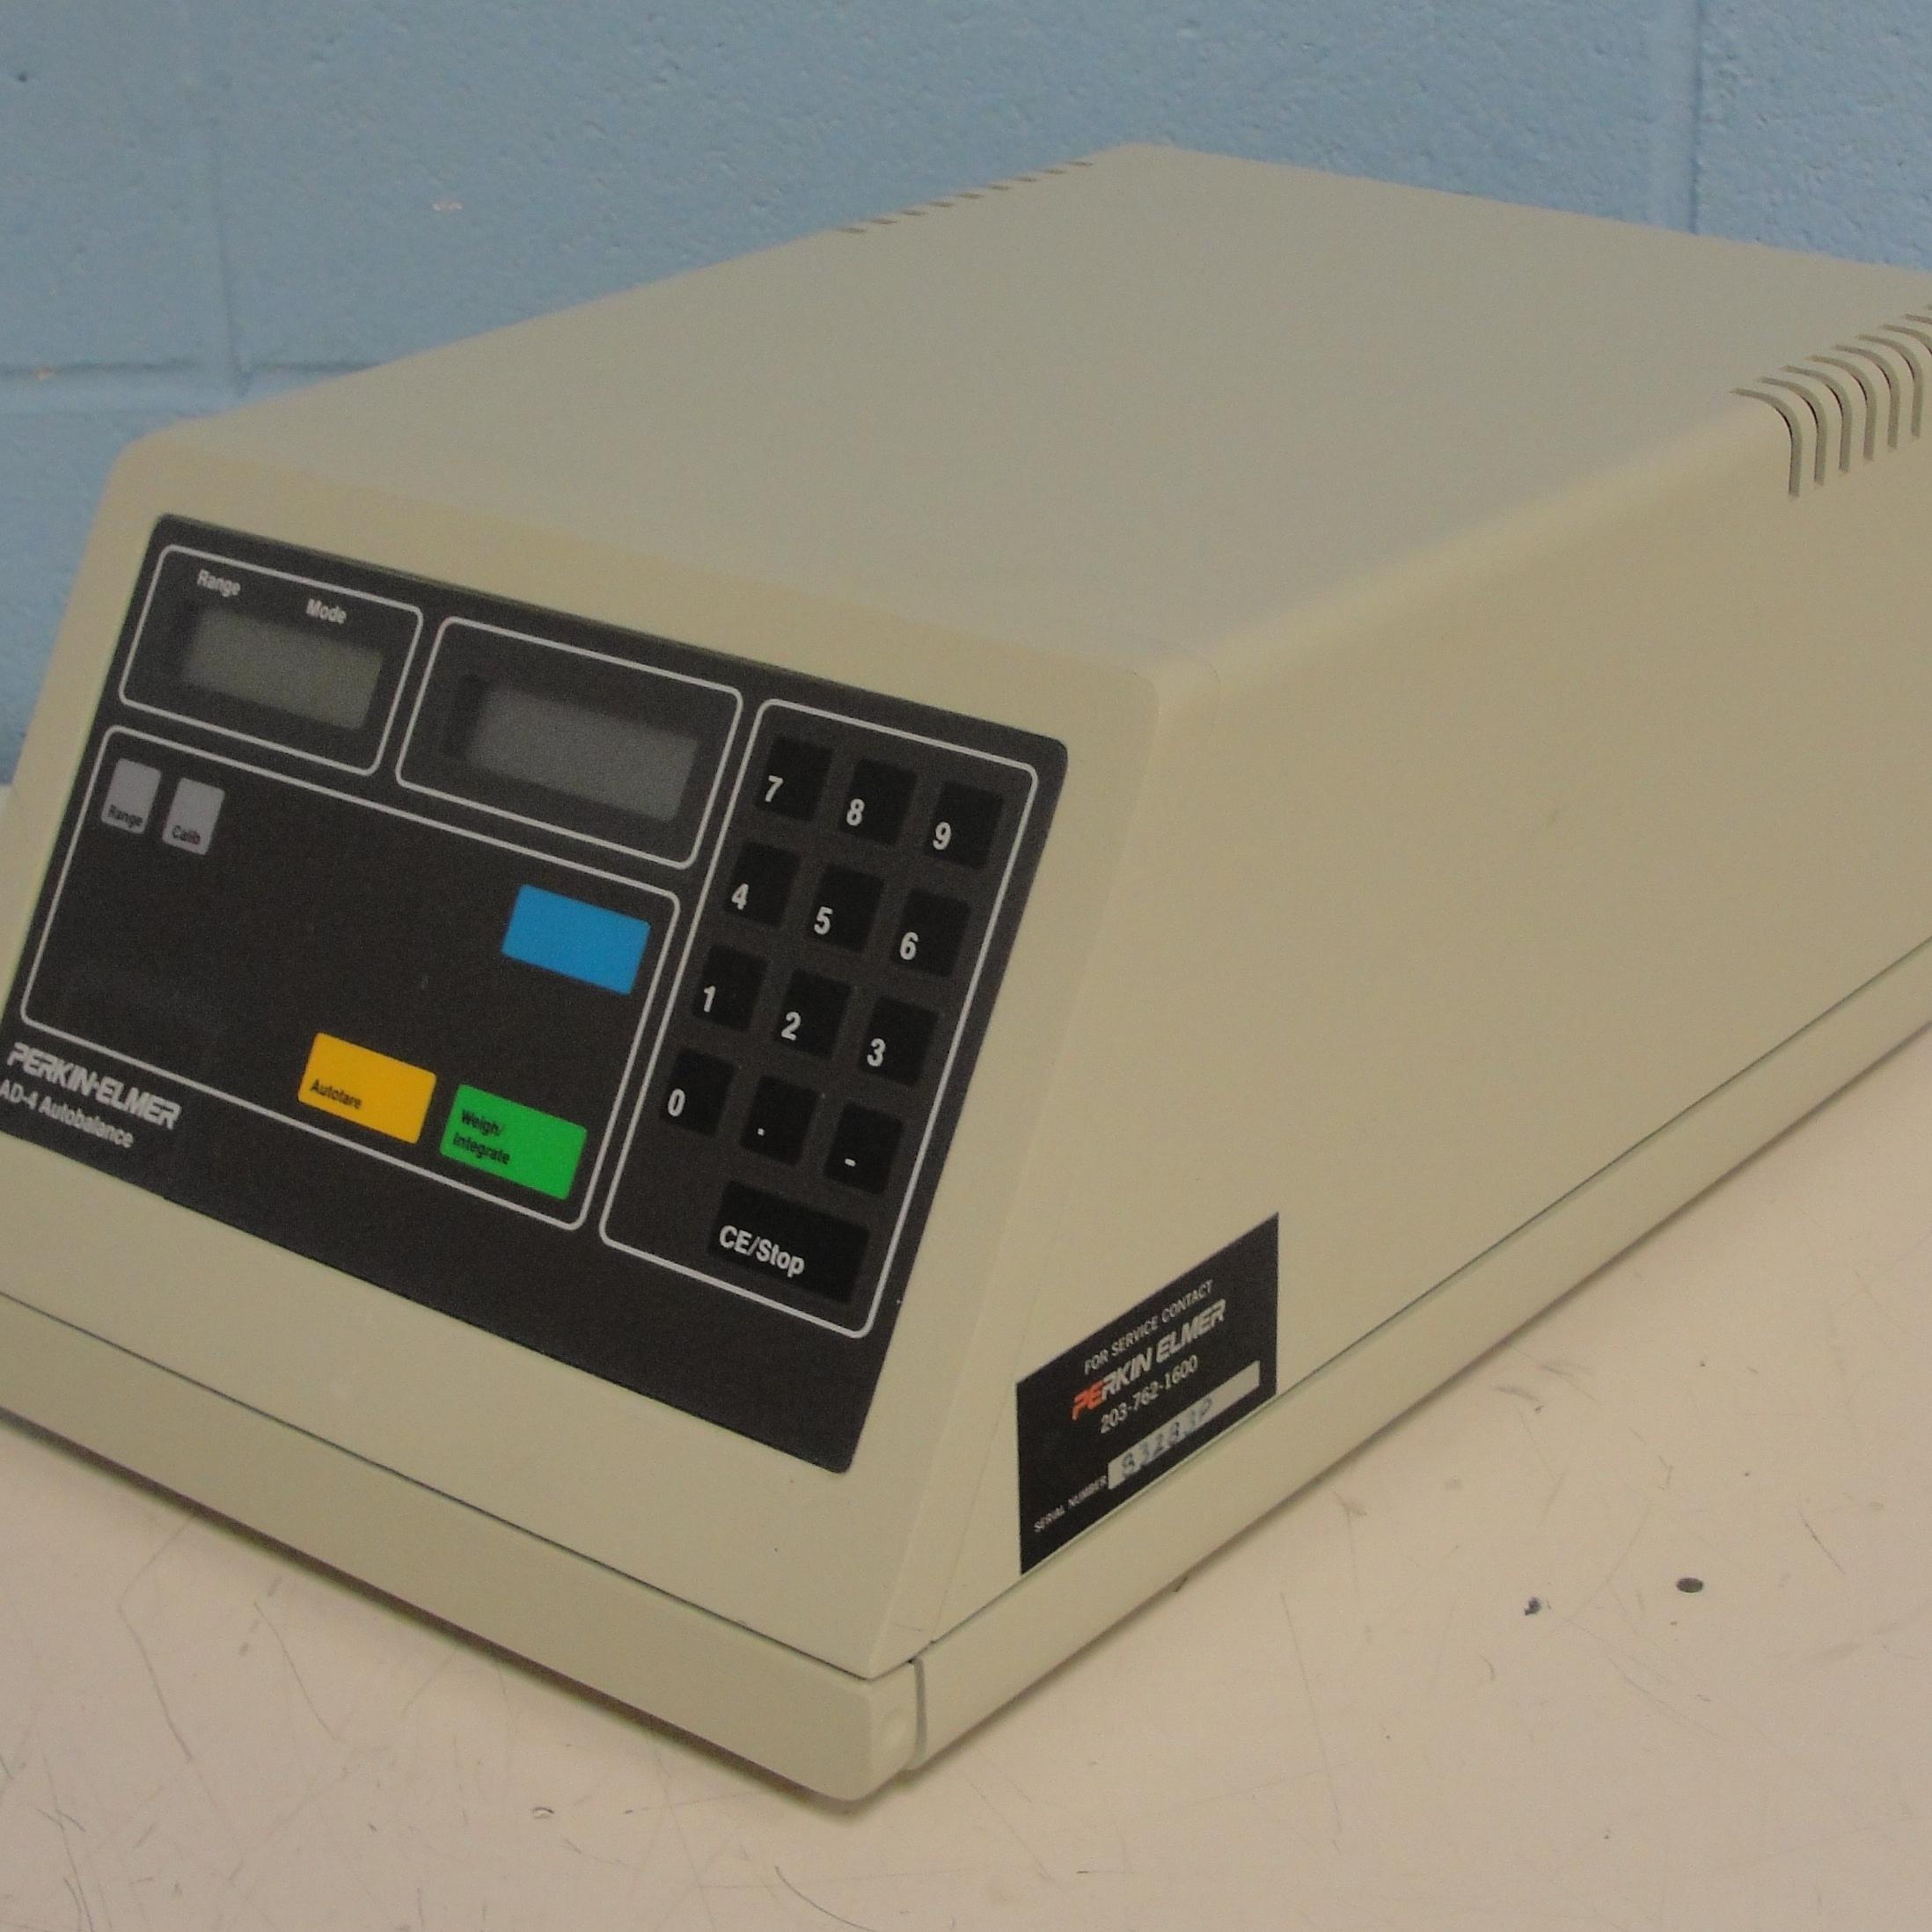 Perkin Elmer AD-4 Autobalance Control Unit Image